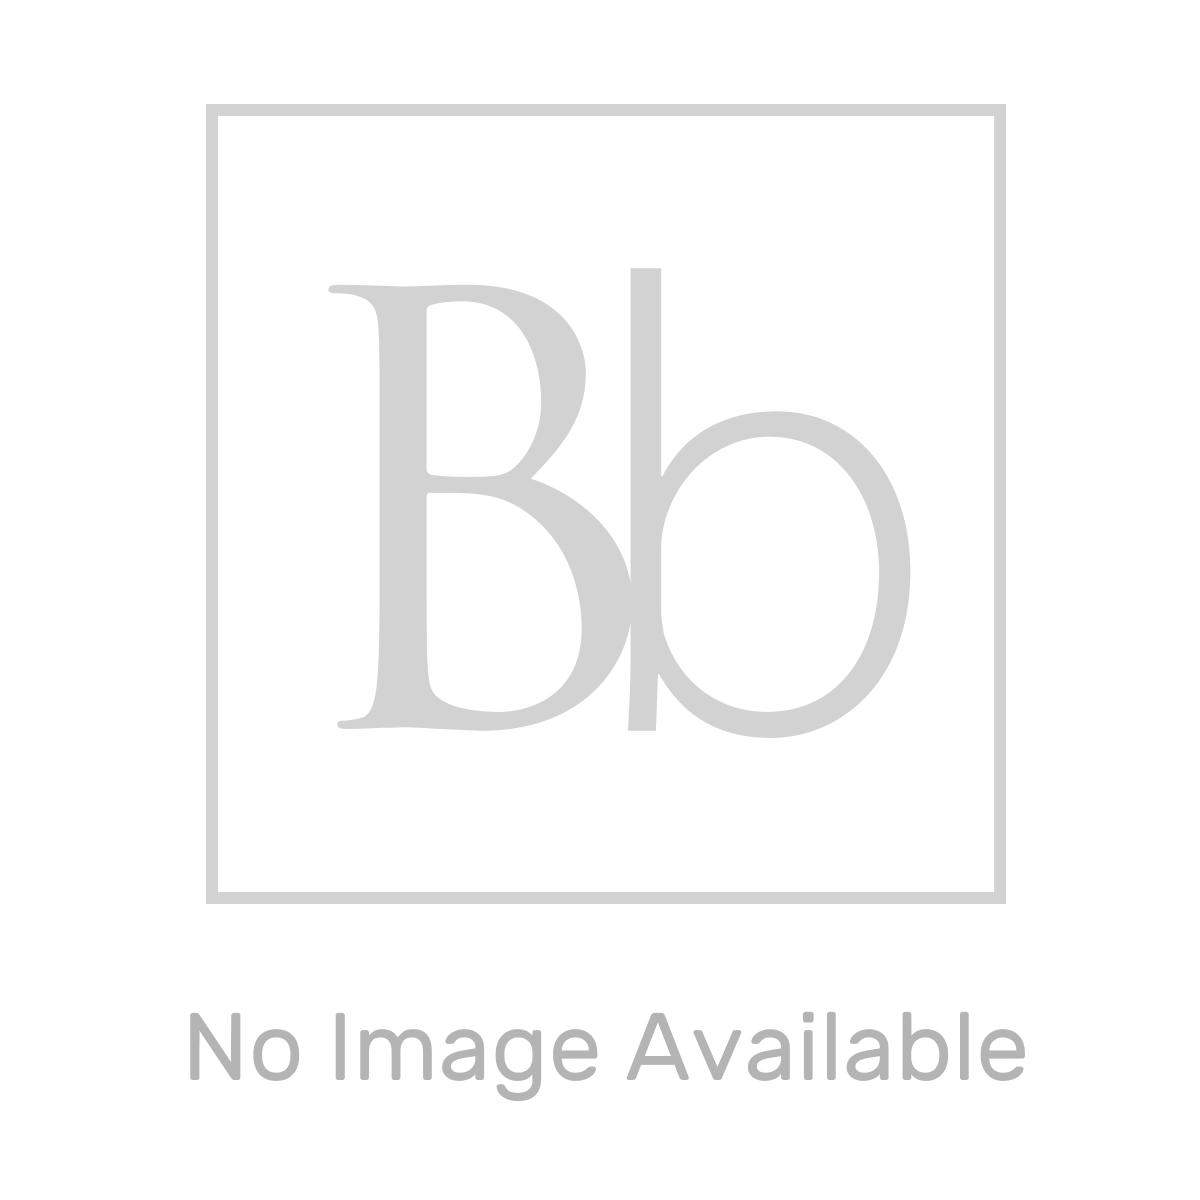 Nuie Linton Straight Shower Bath 1400 x 700mm Dimensions